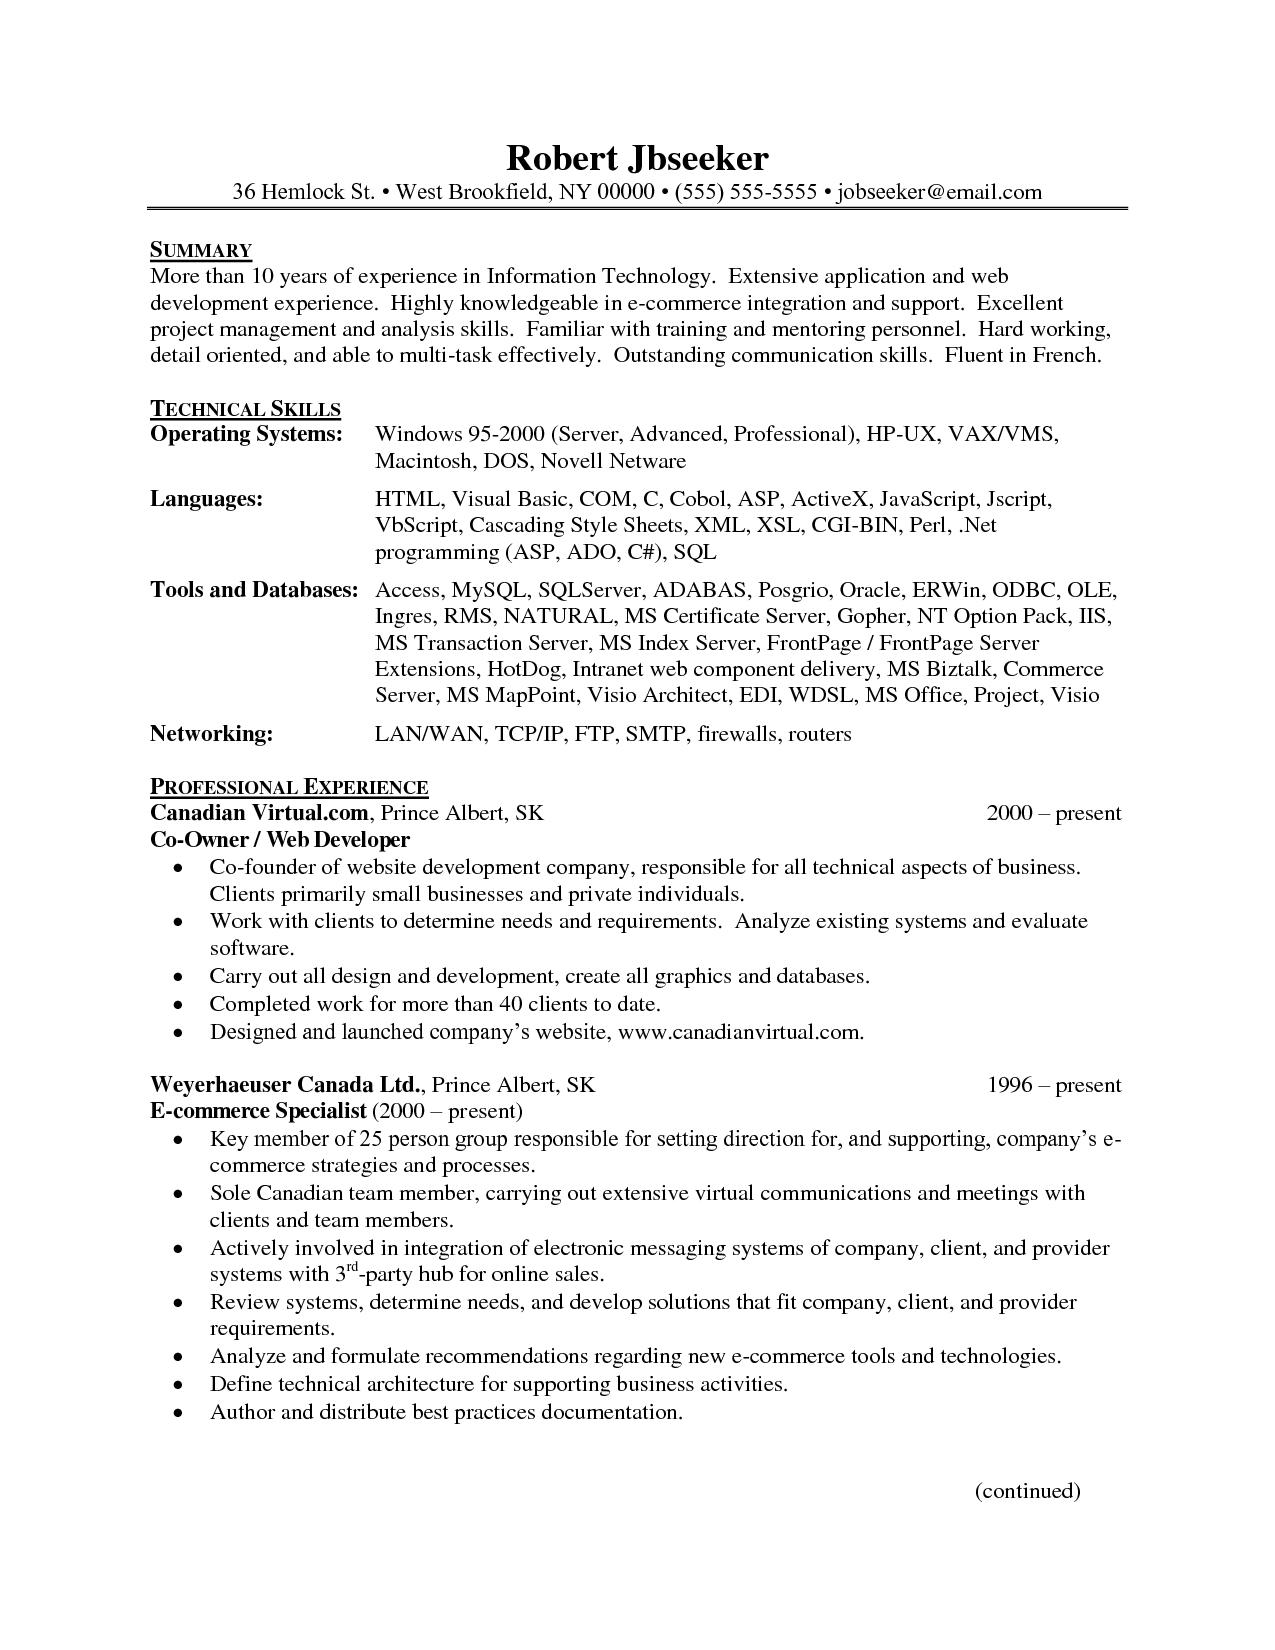 Web Designer Resume Example Download Web Developer Resume Graphic Design Resume Web Designer Resume